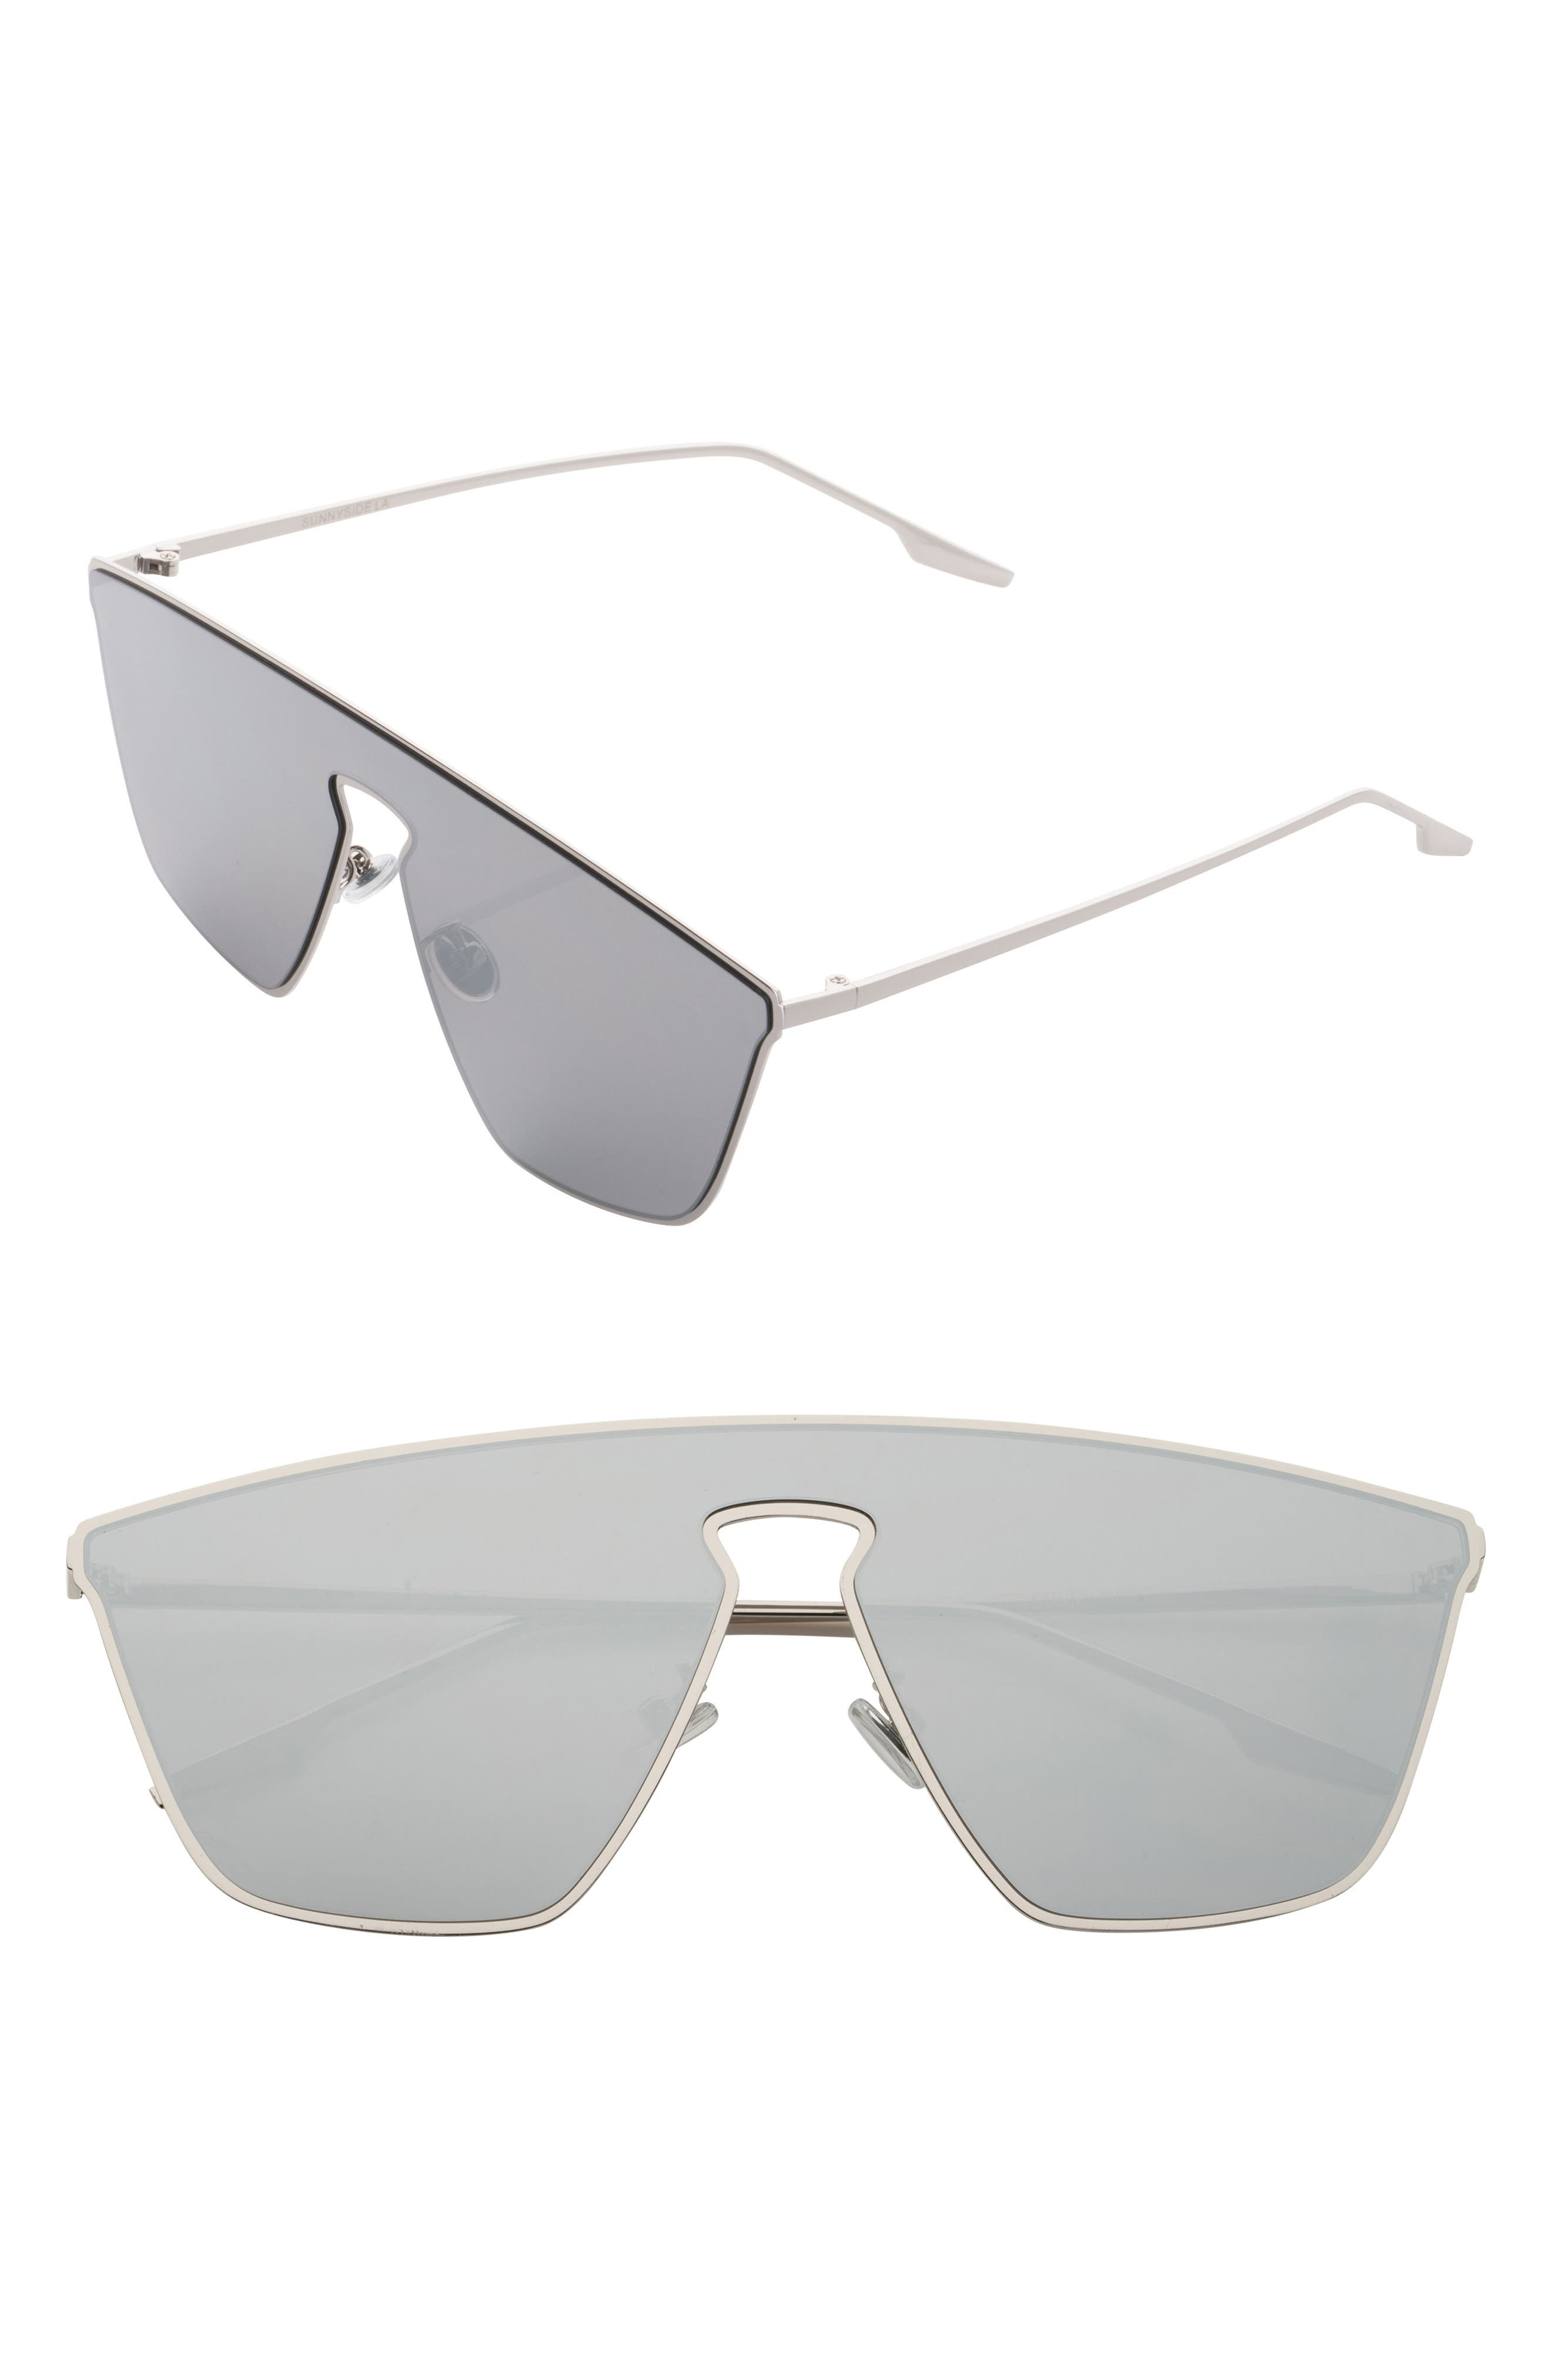 SunnySide LA 65mm Shield Sunglasses